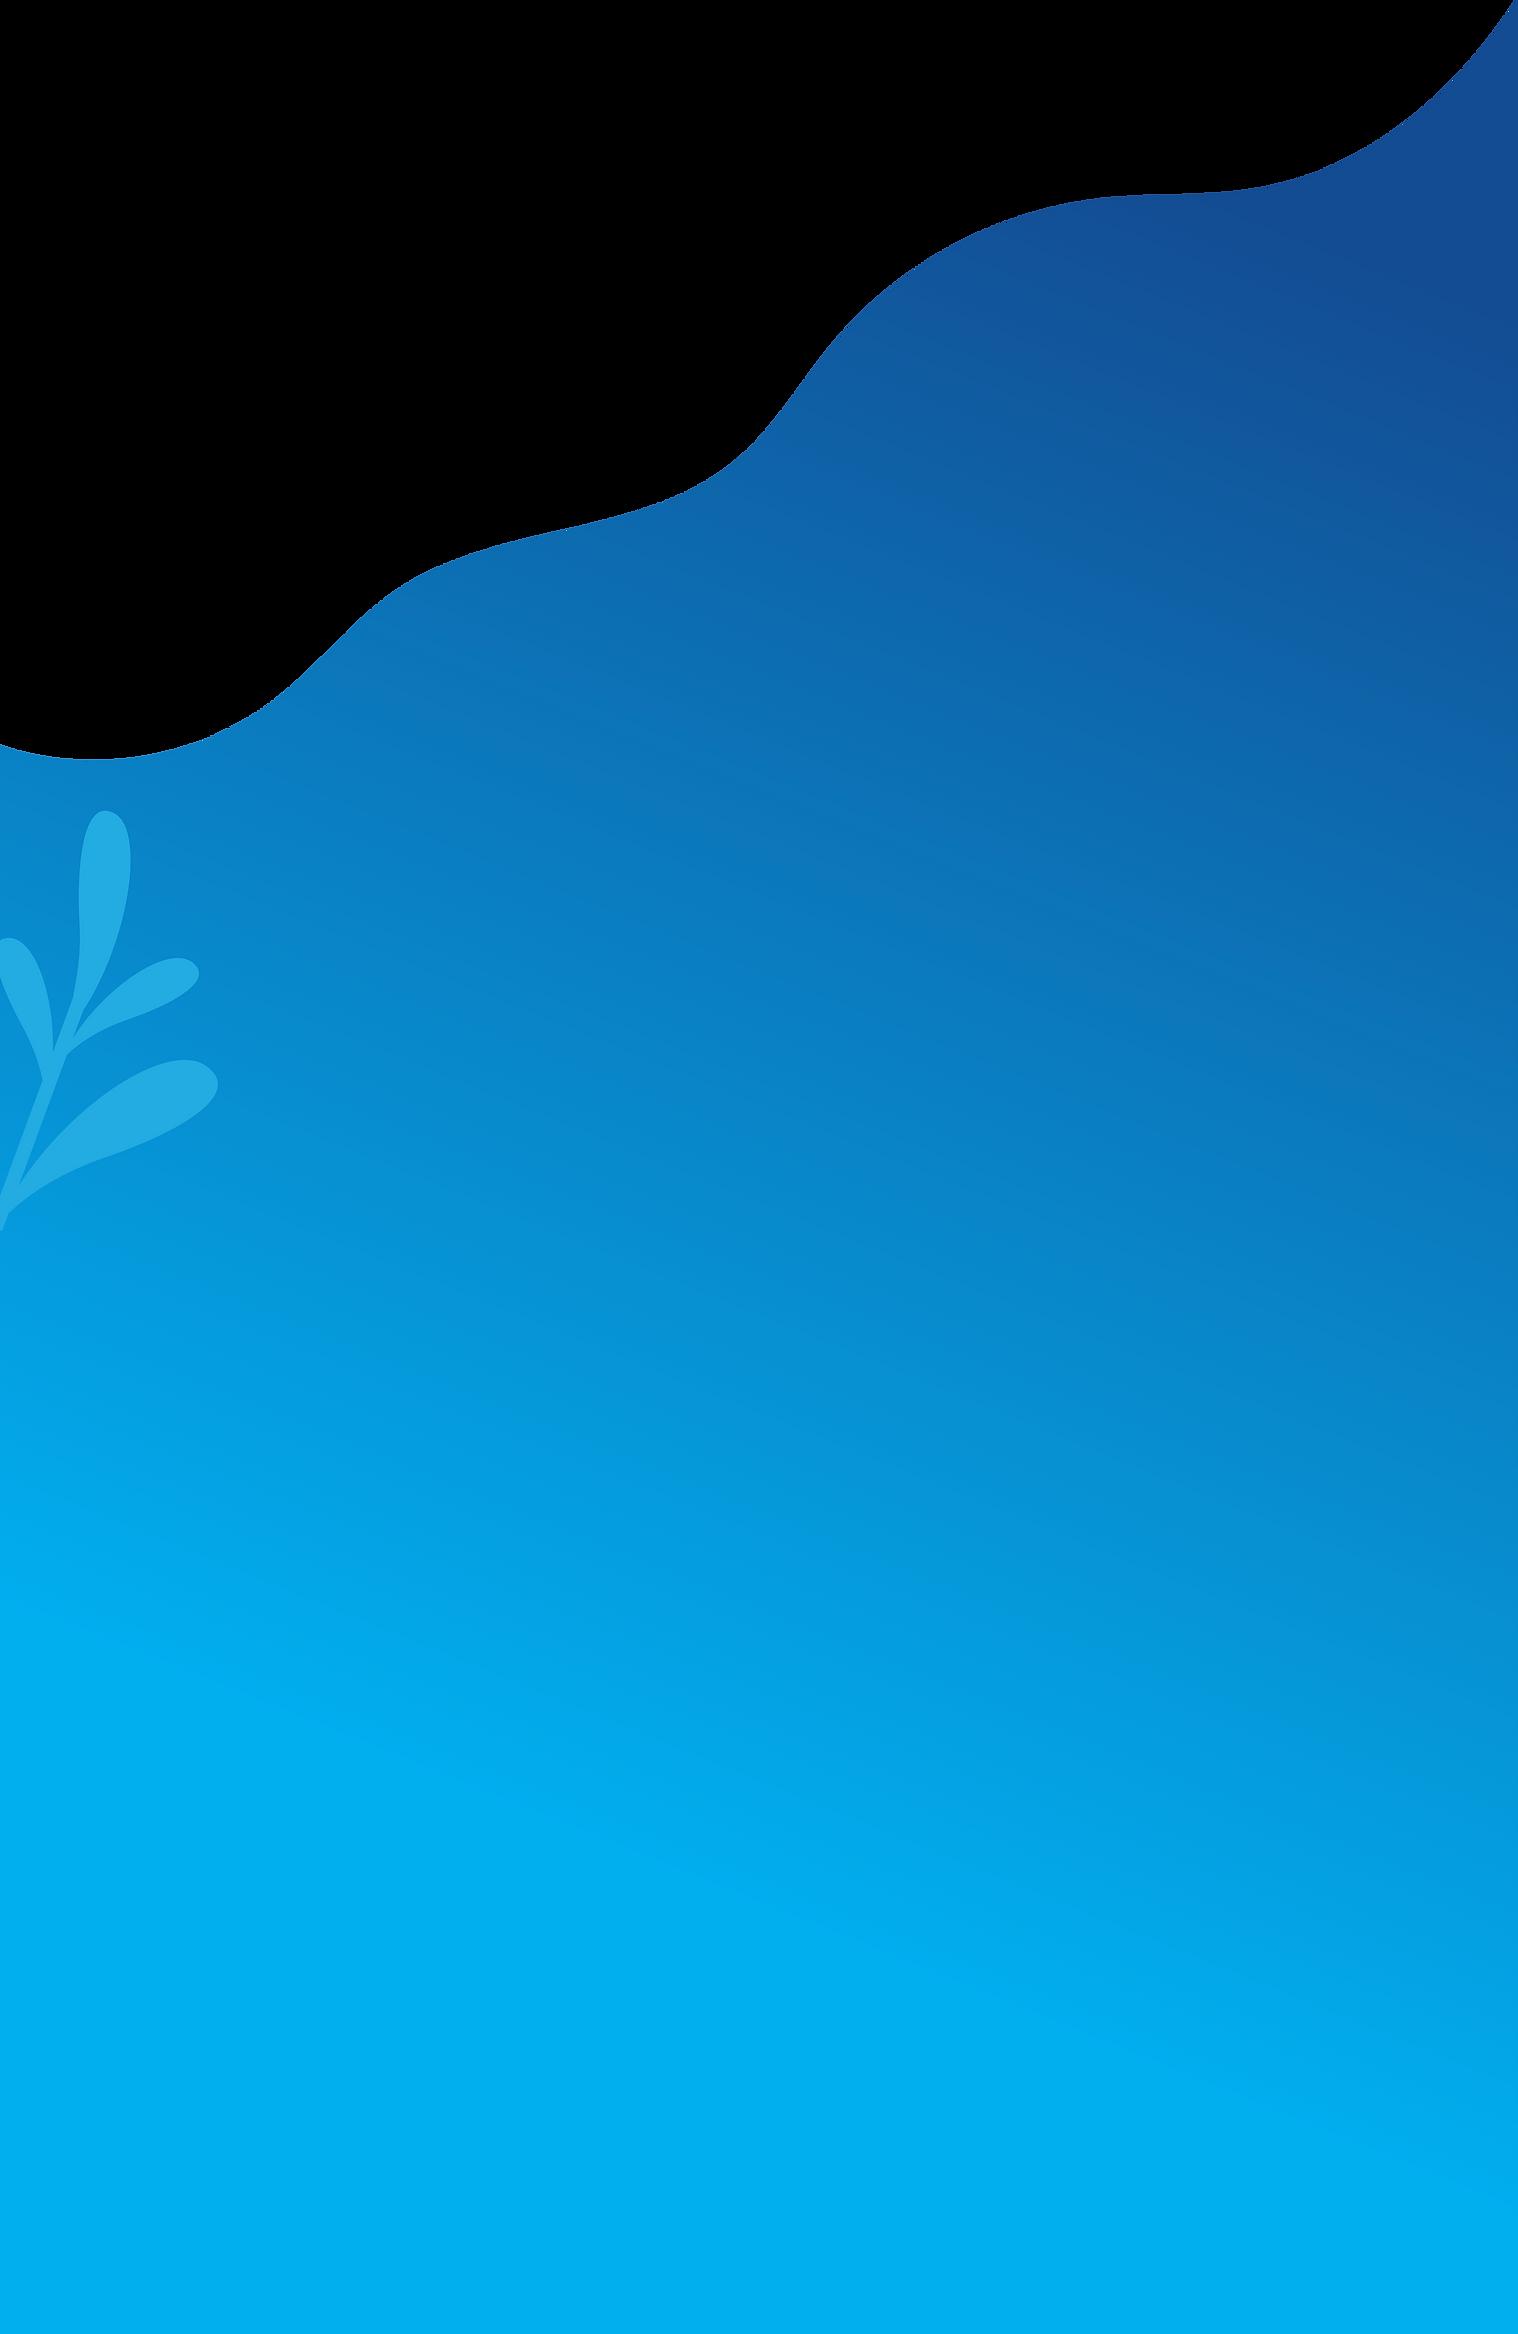 Fundo azul contato.png